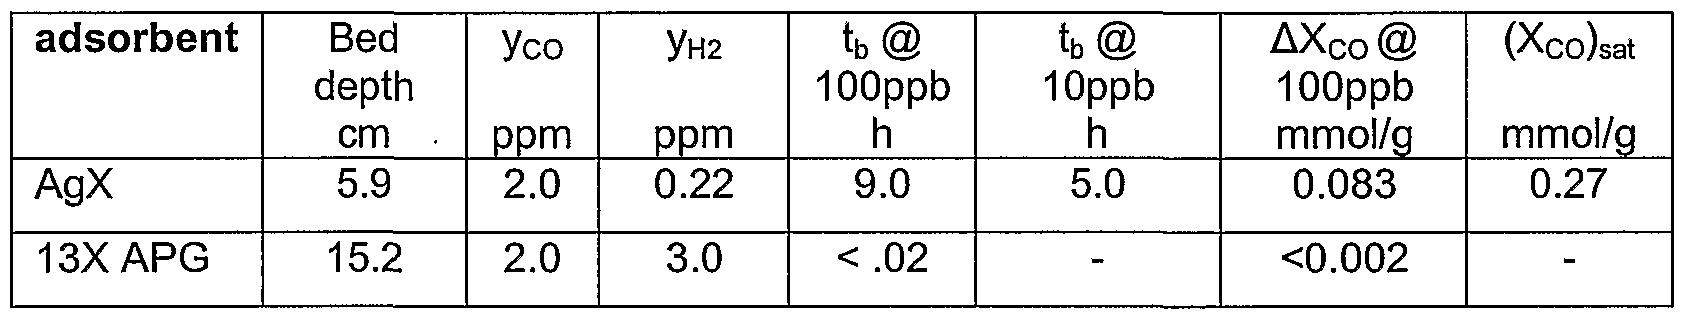 WO2007005399A1 - Gas purification process using adsorbent